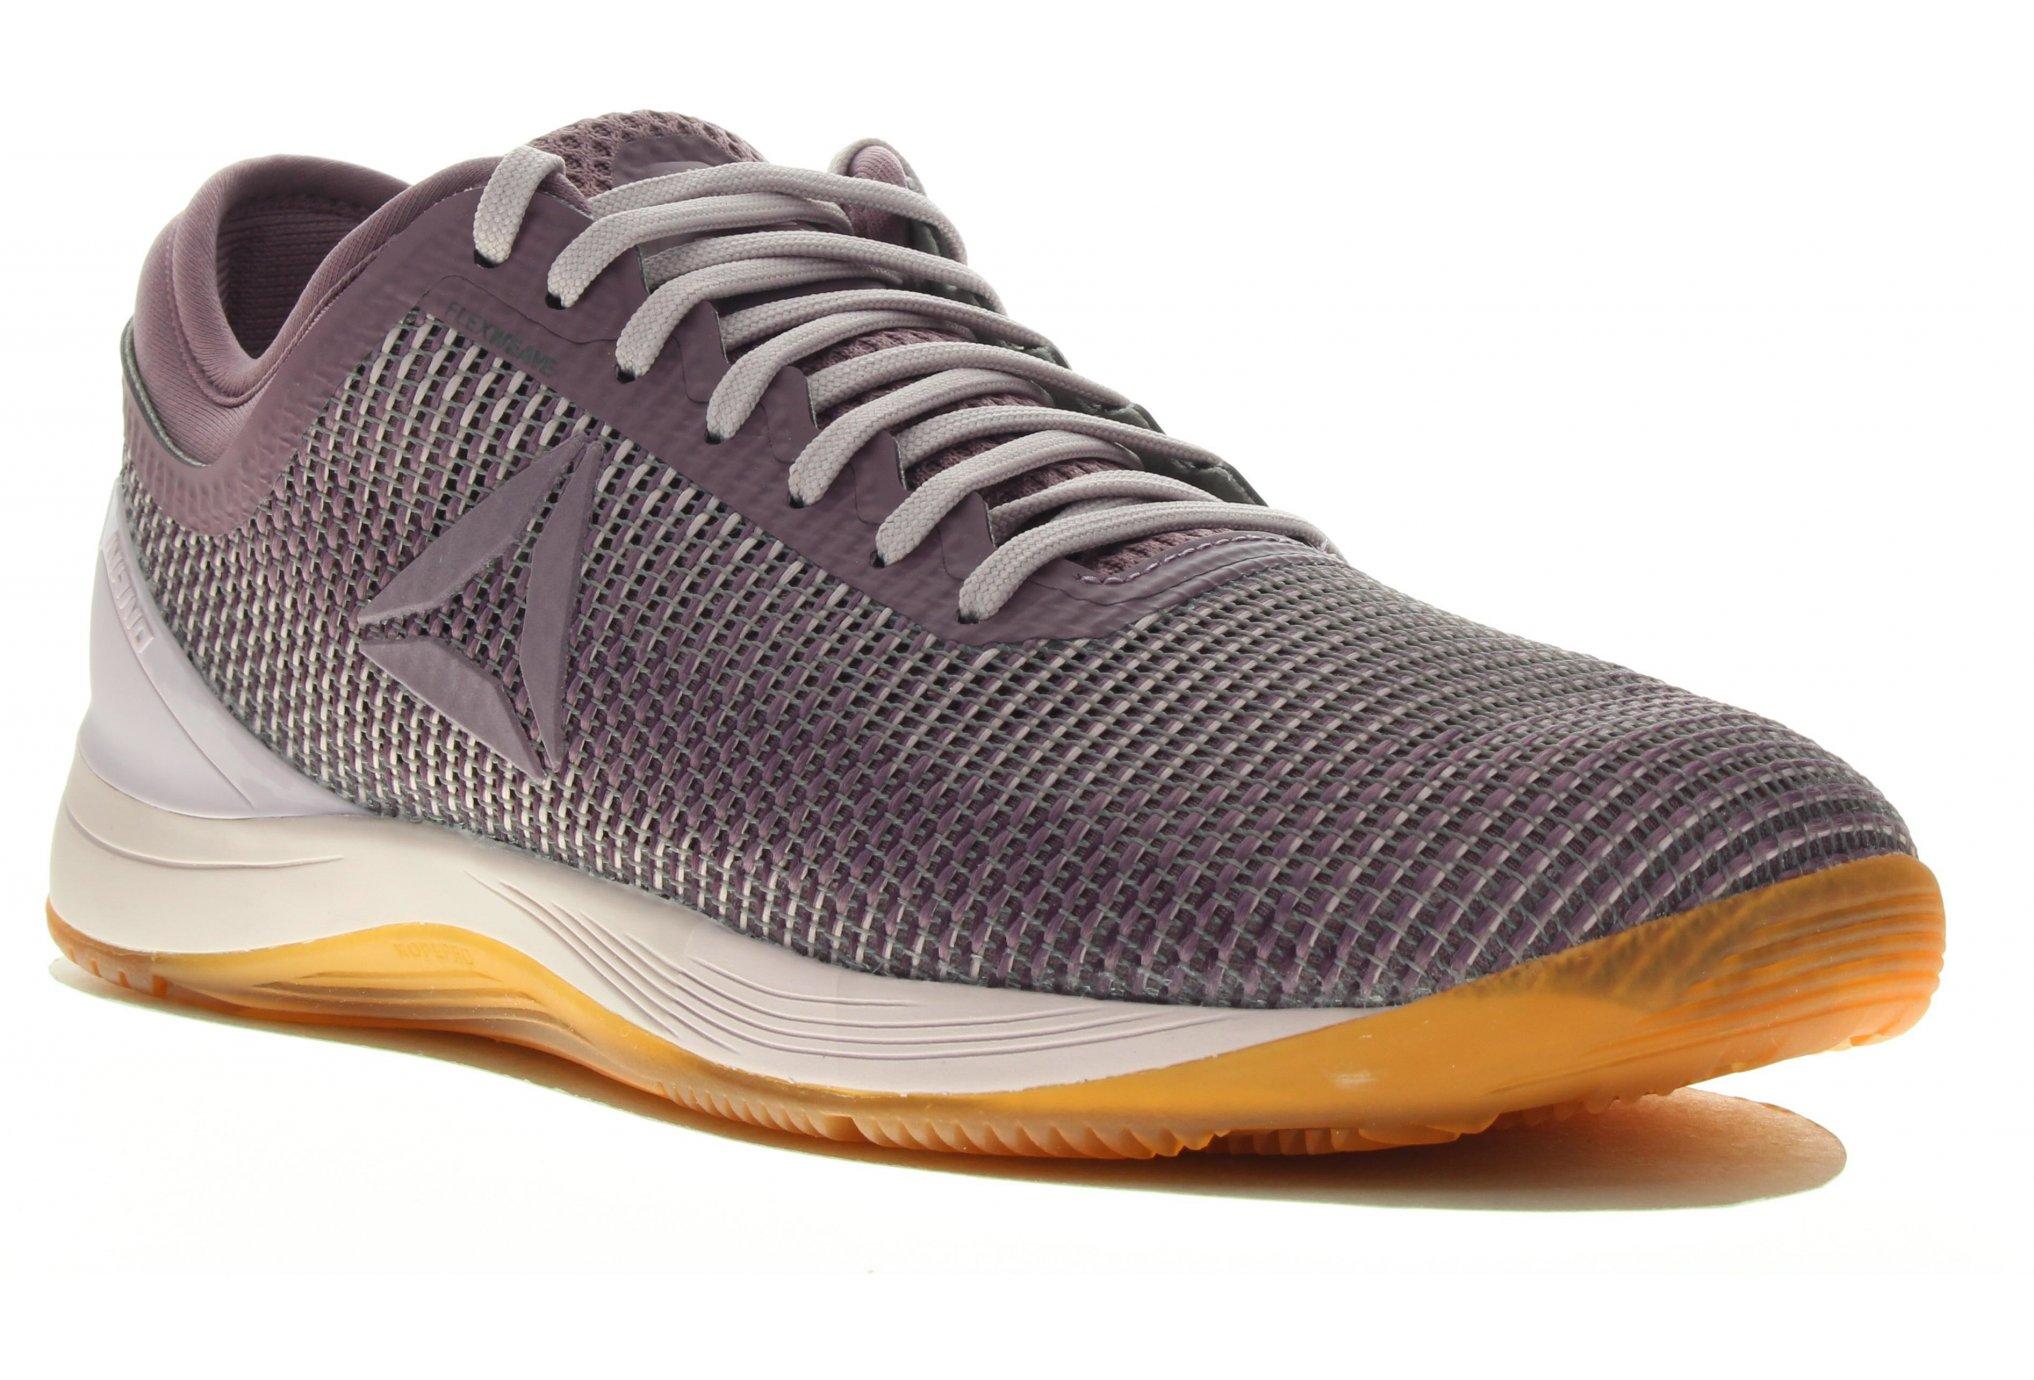 Reebok Crossfit Nano 8 Flexweave W Chaussures running femme